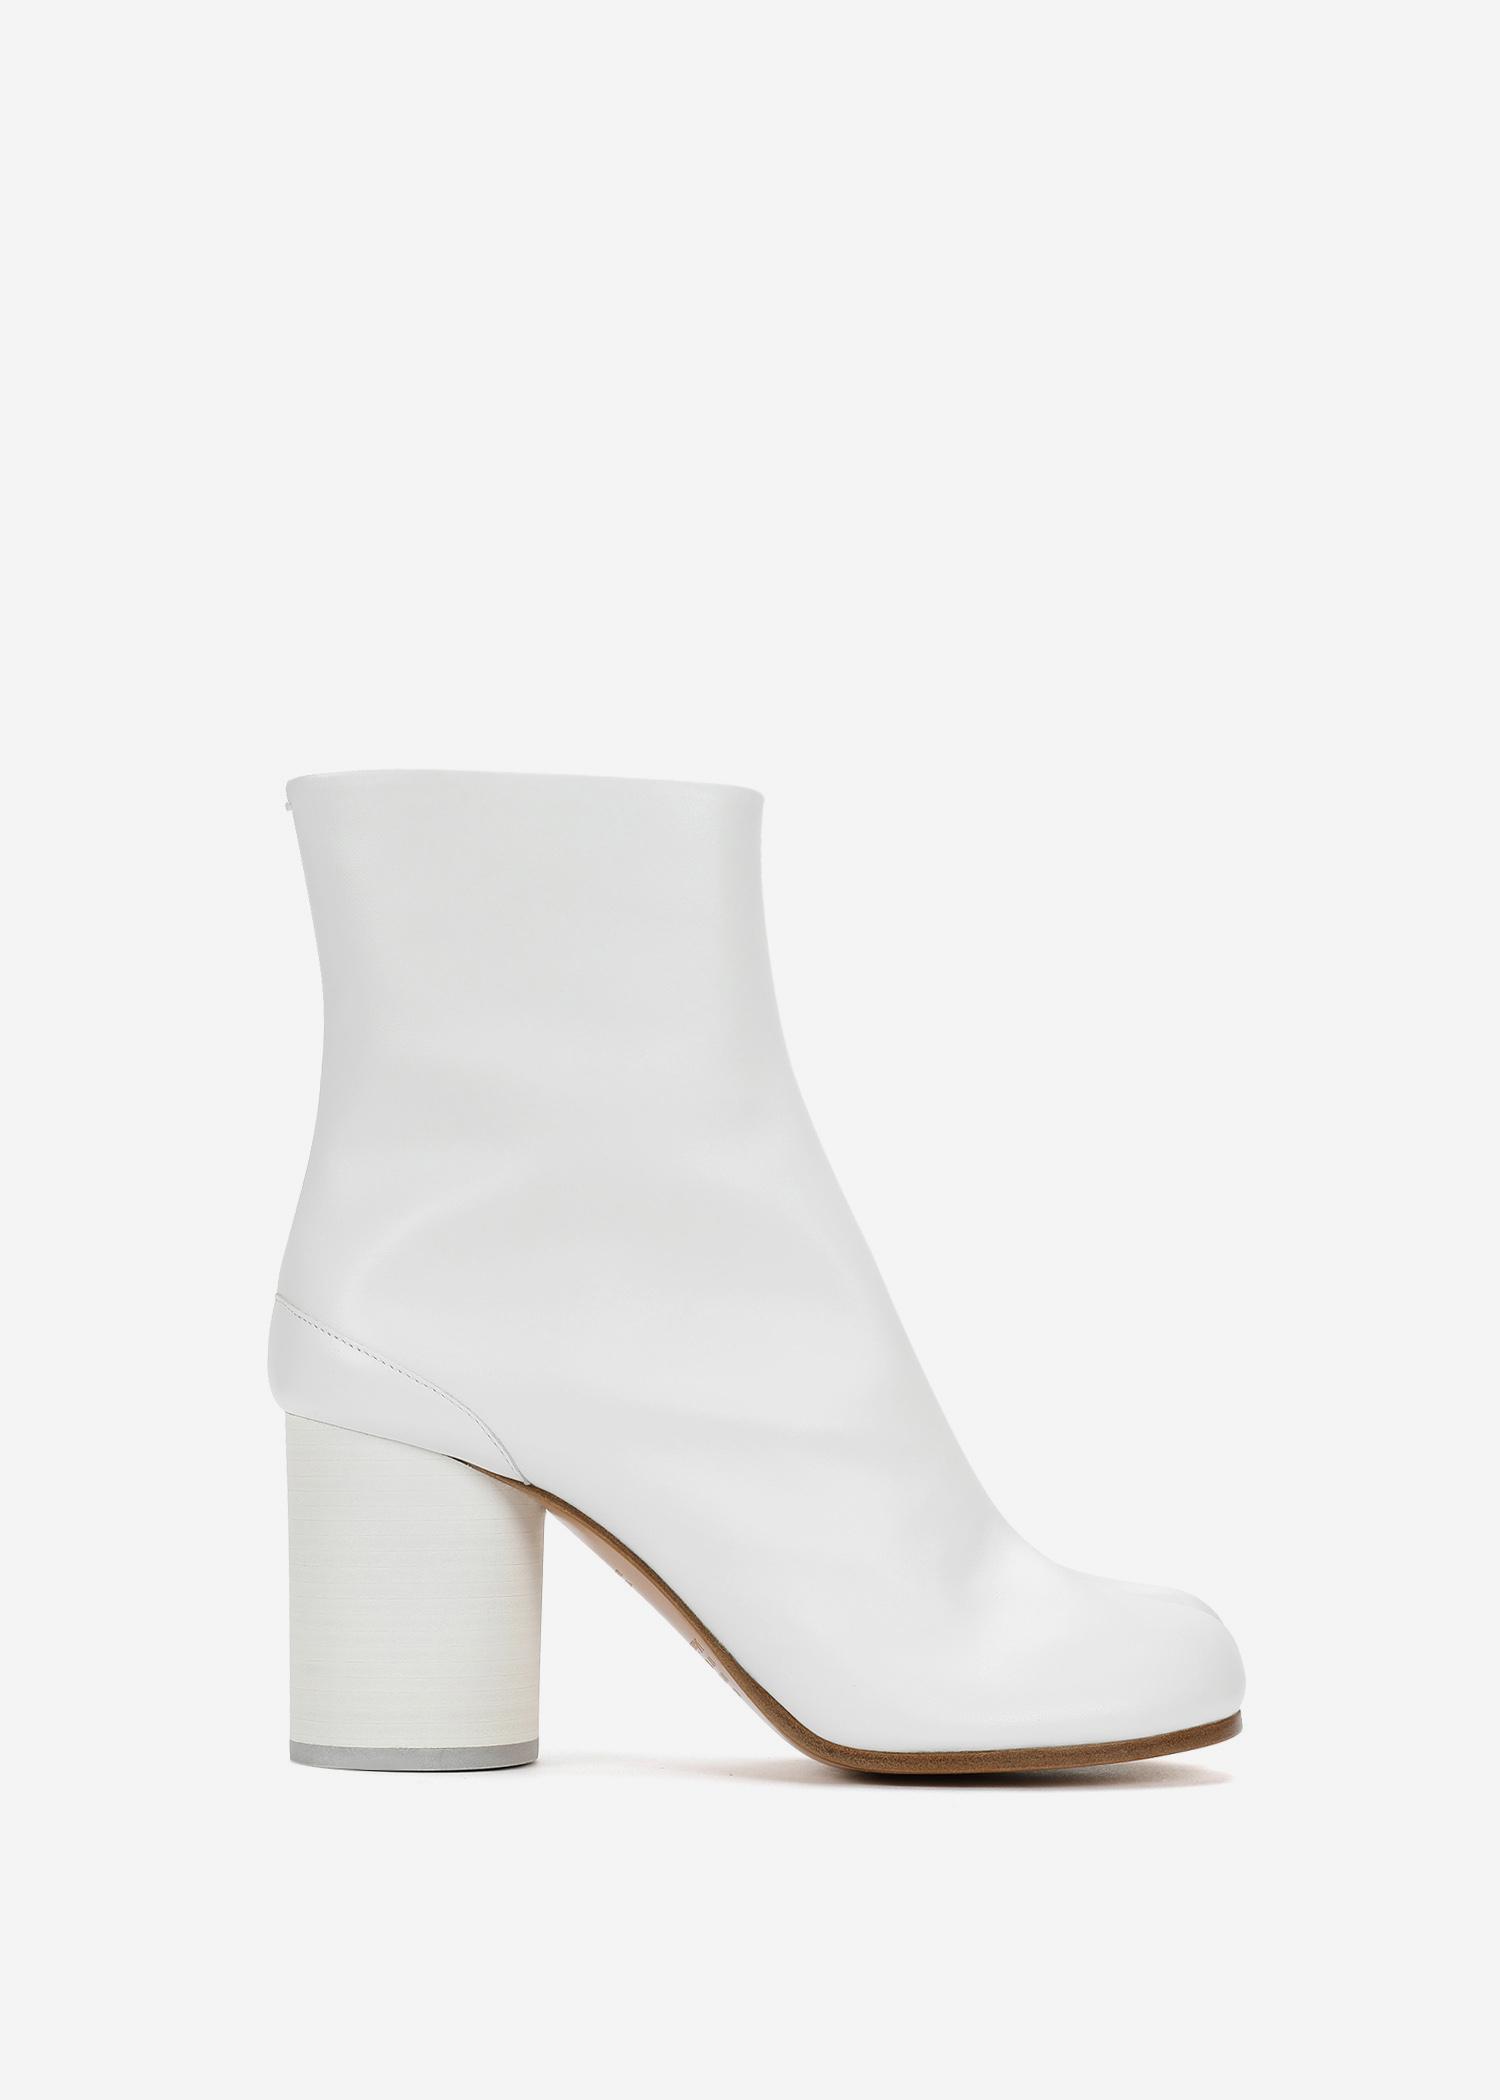 ff2f3794e95 Lyst - Maison Margiela Classic Tabi Boots in White